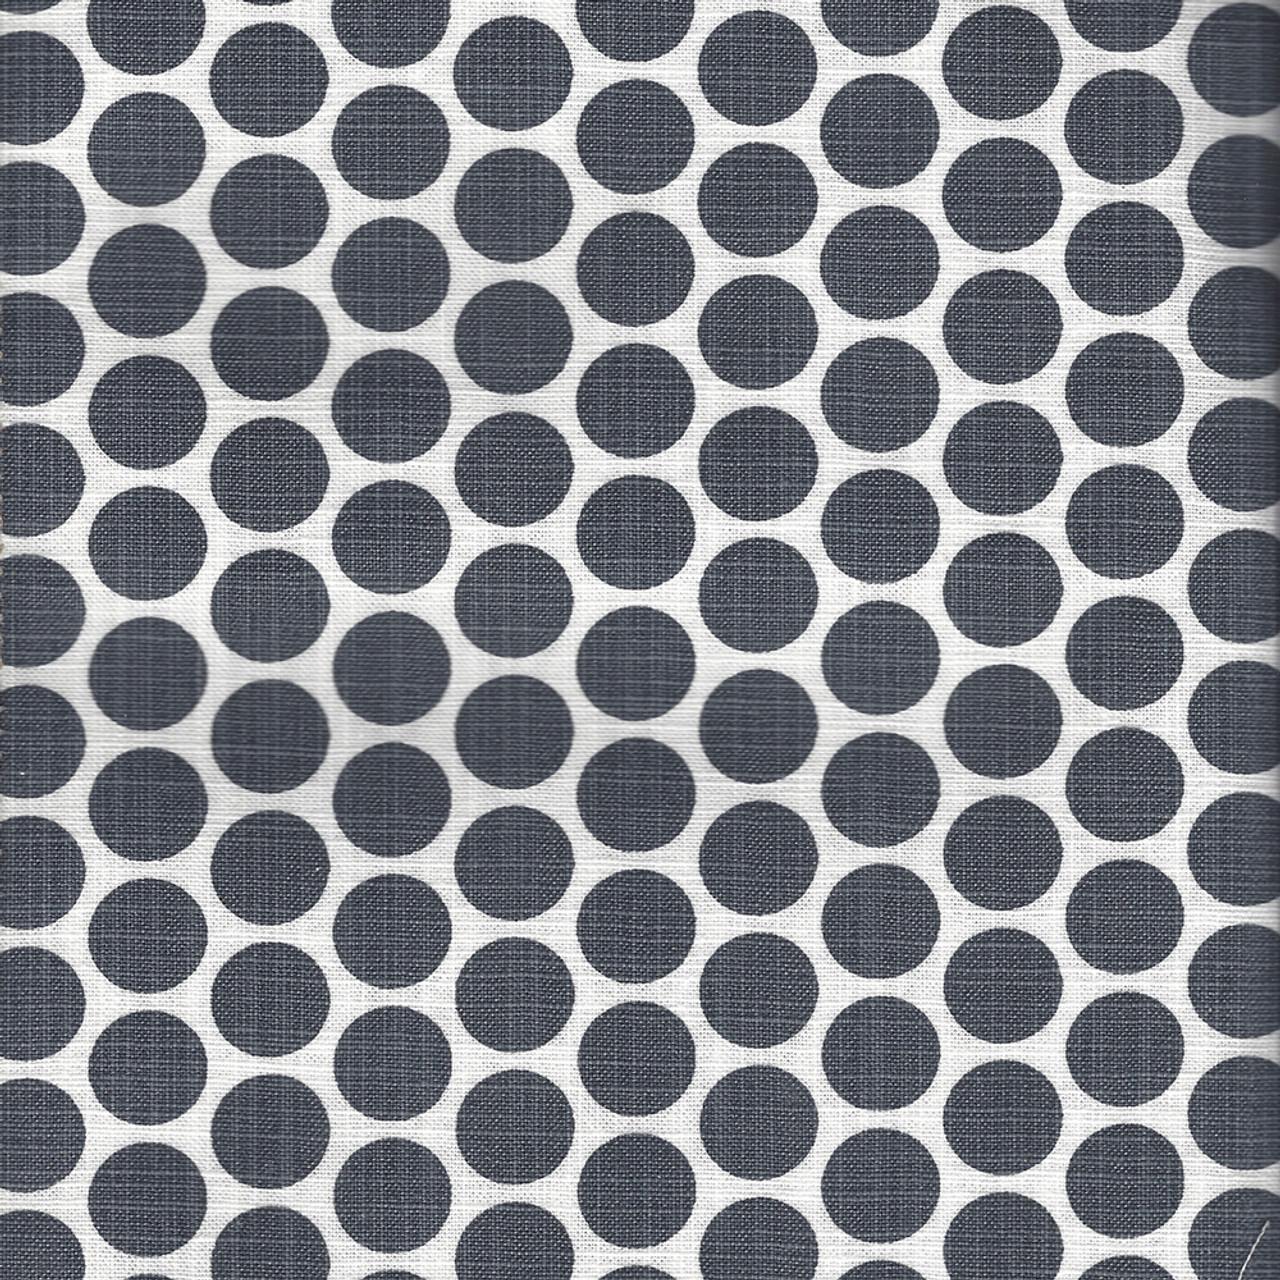 Paco Black Flame Polka Dot Dark Gray Slub Cotton Shower Curtain